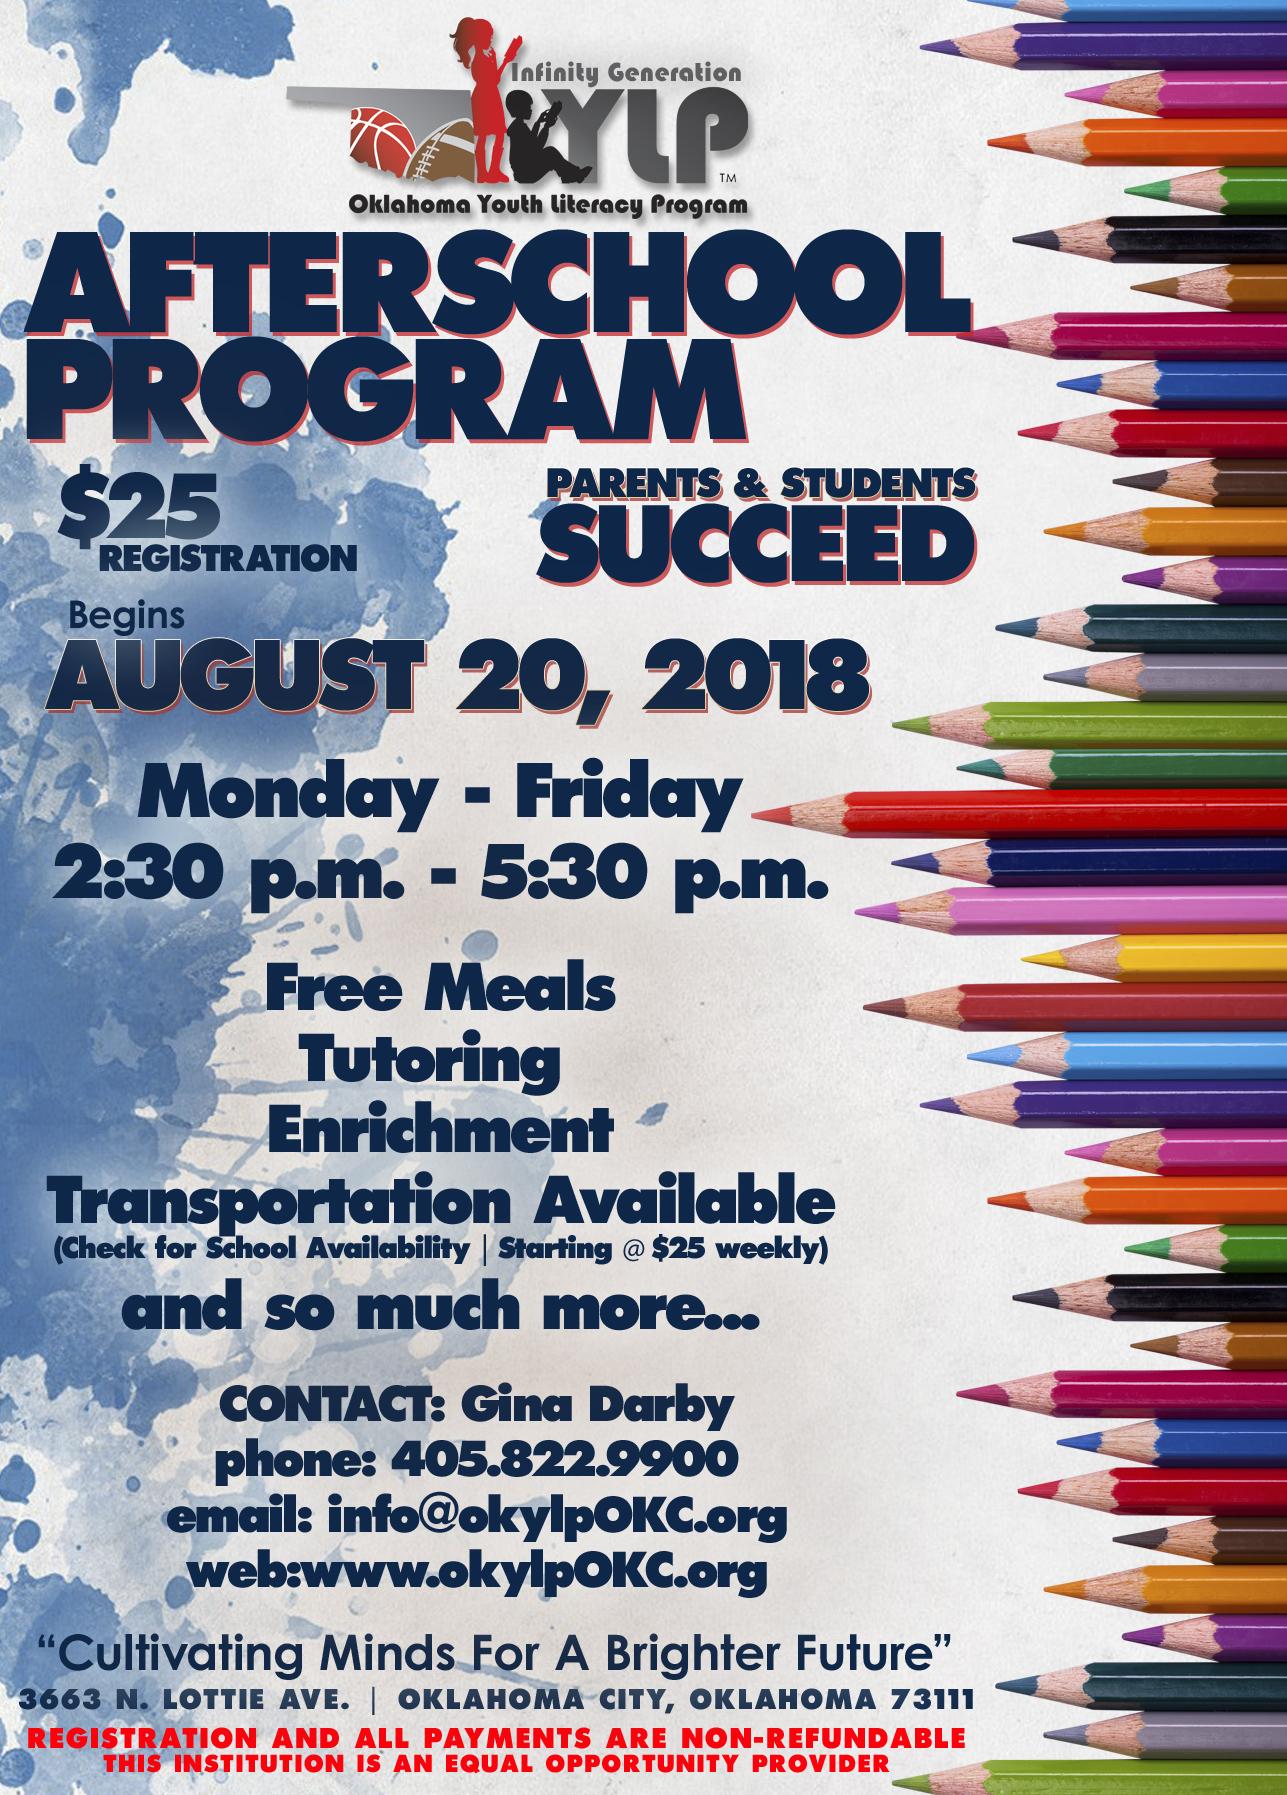 okylp afterschool program 2018